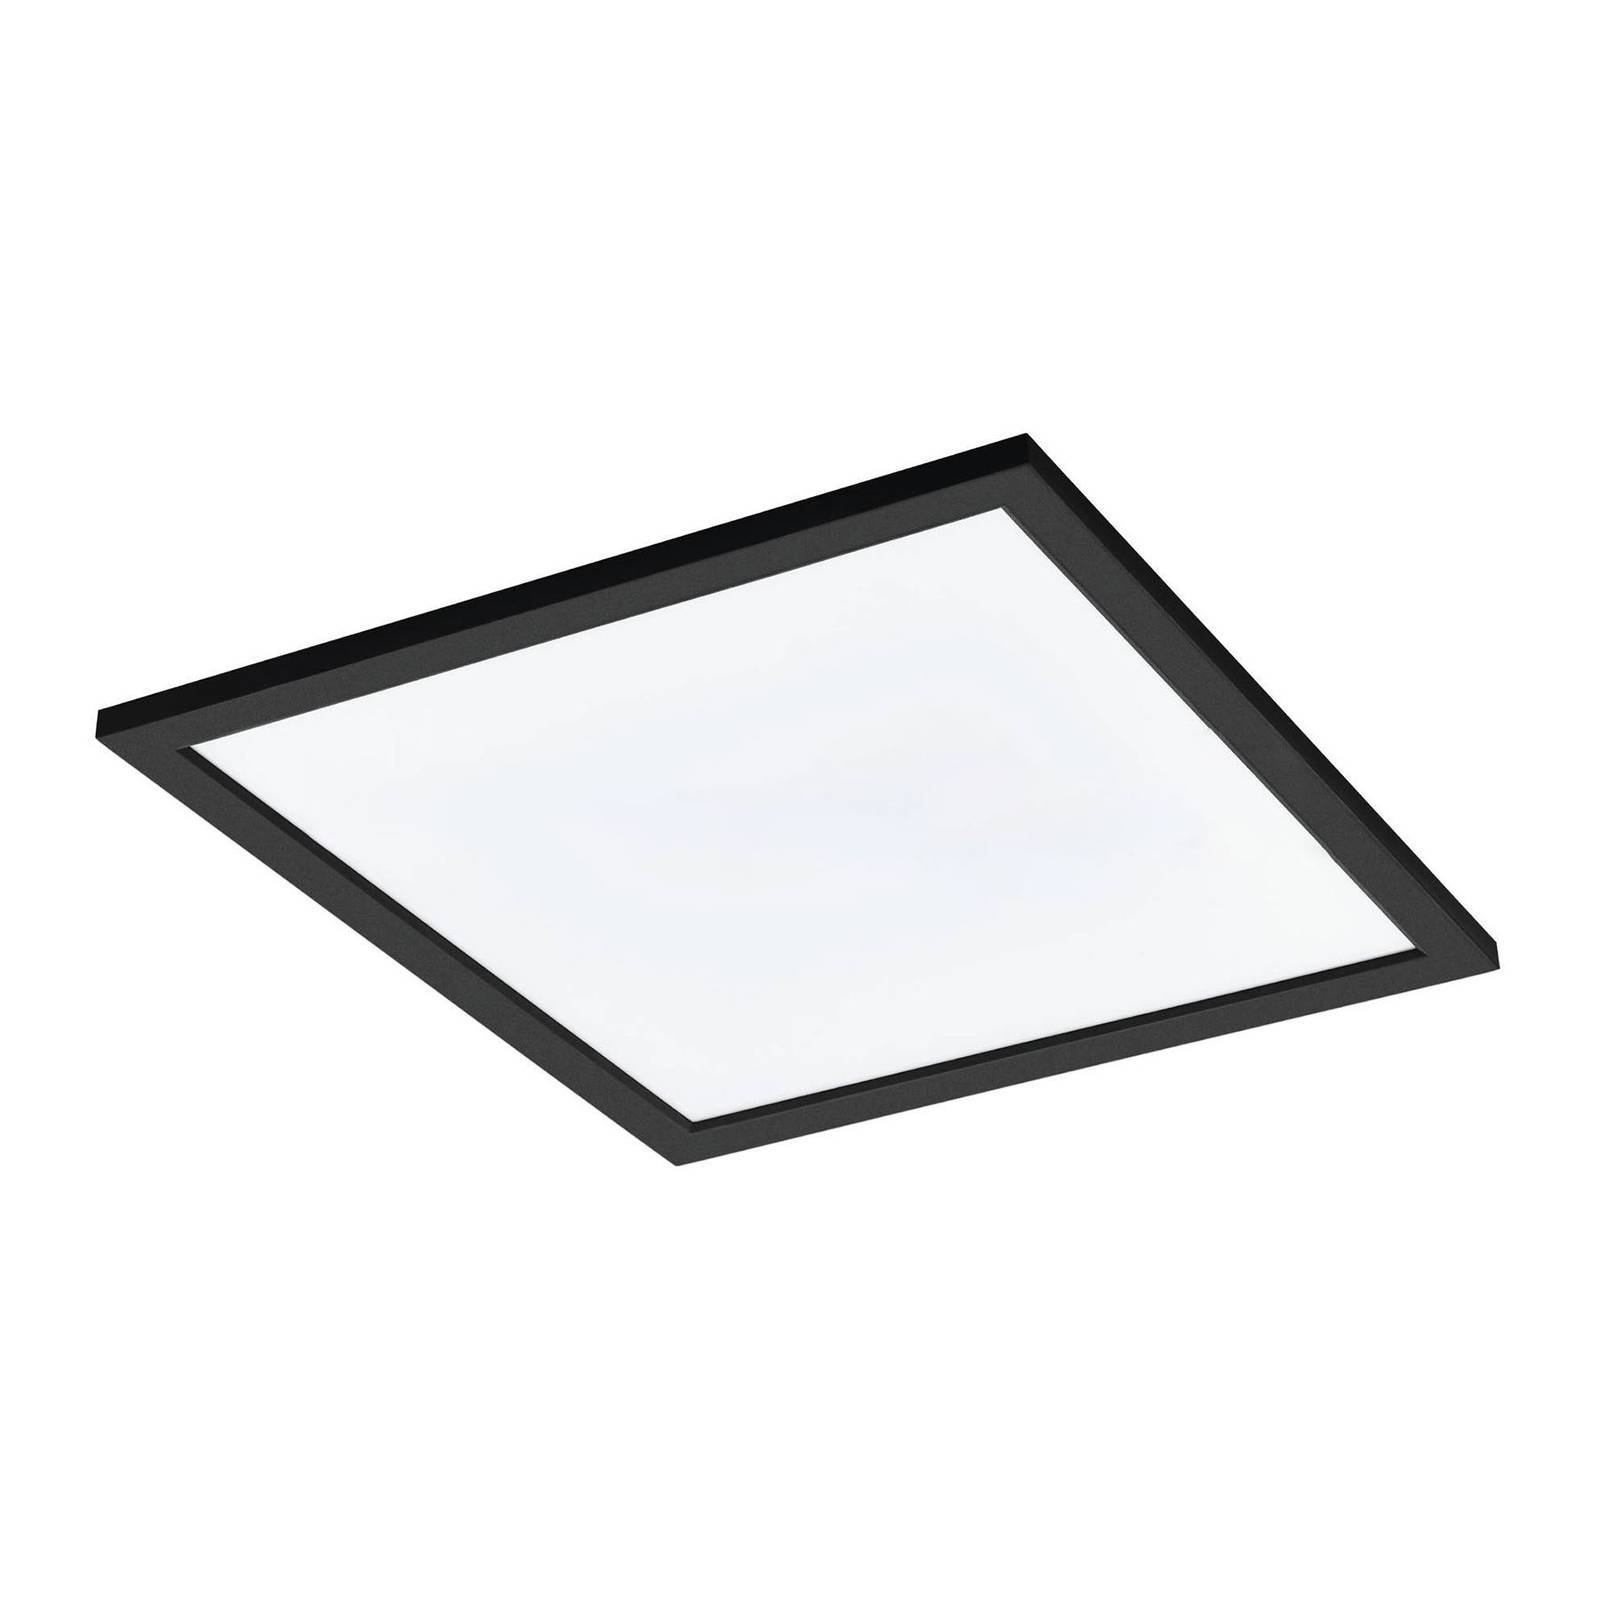 EGLO connect Salobrena-C LED-panel, svart 45x45 cm